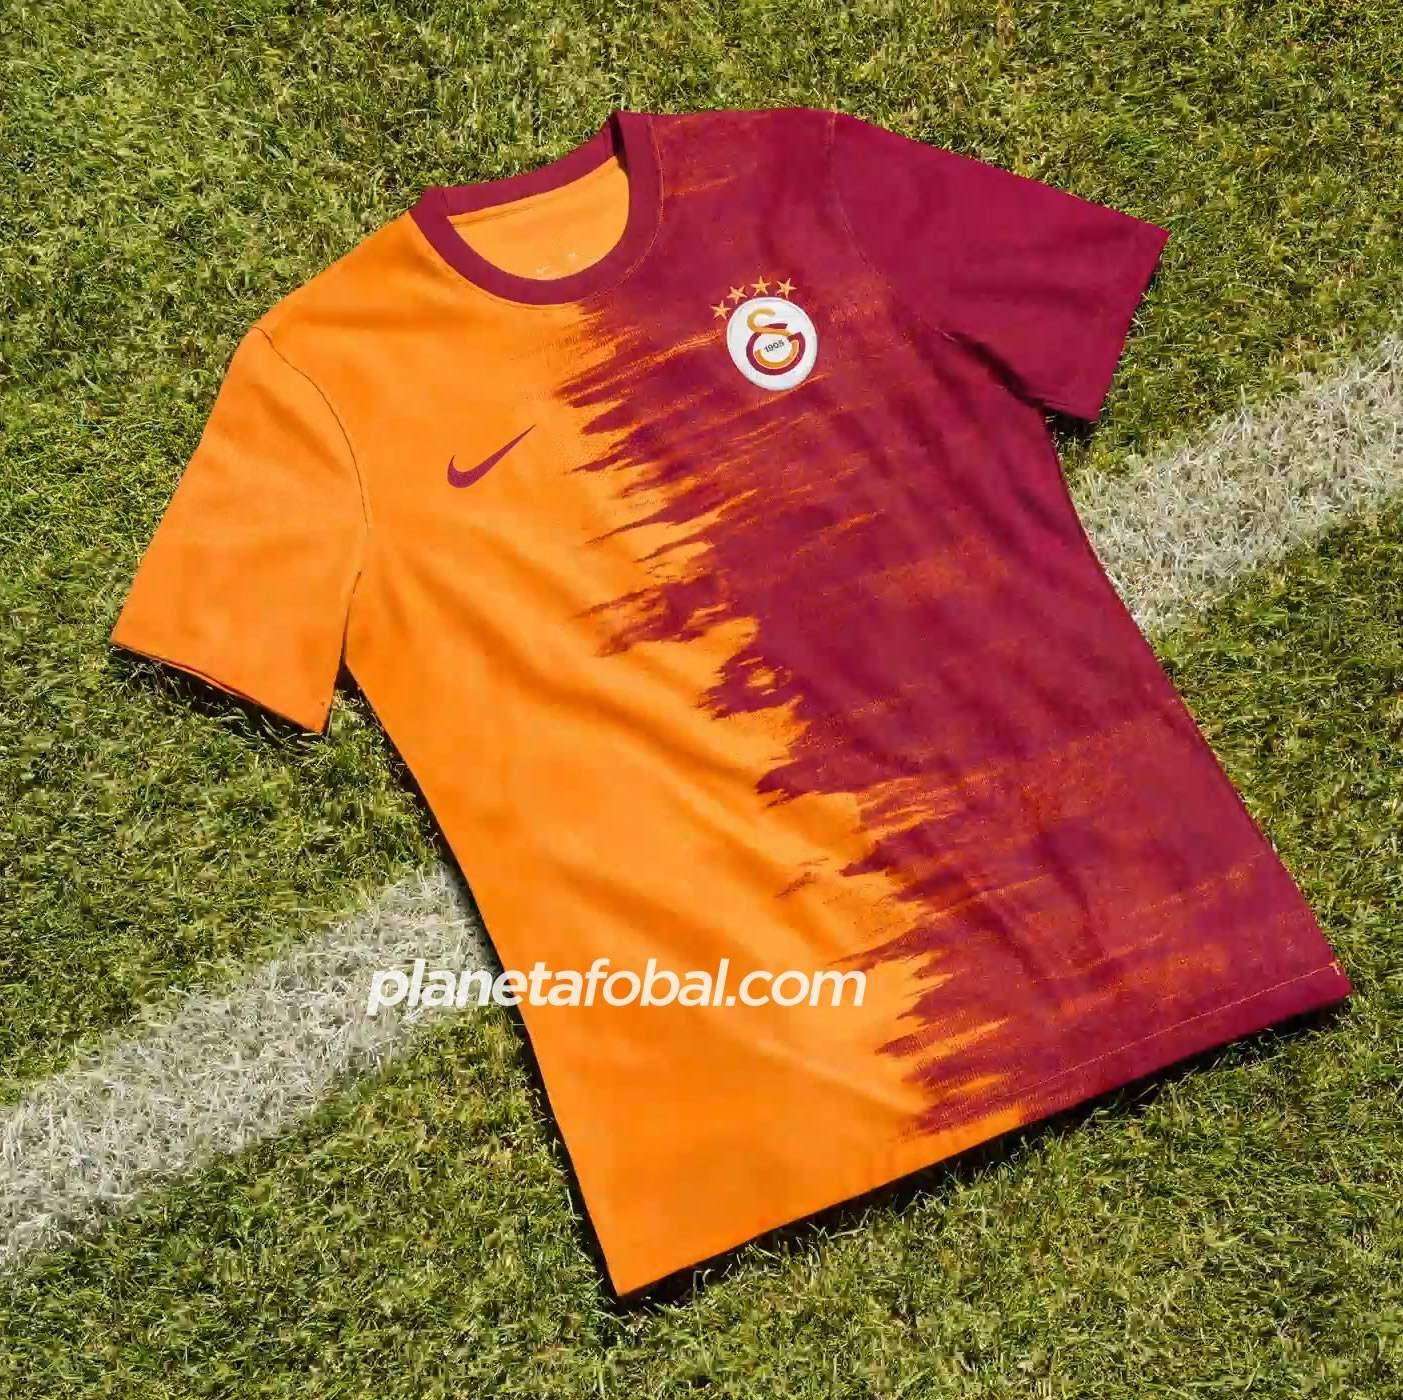 Camiseta titular Nike del Galatasaray 2020/21 | Imagen Web Oficial